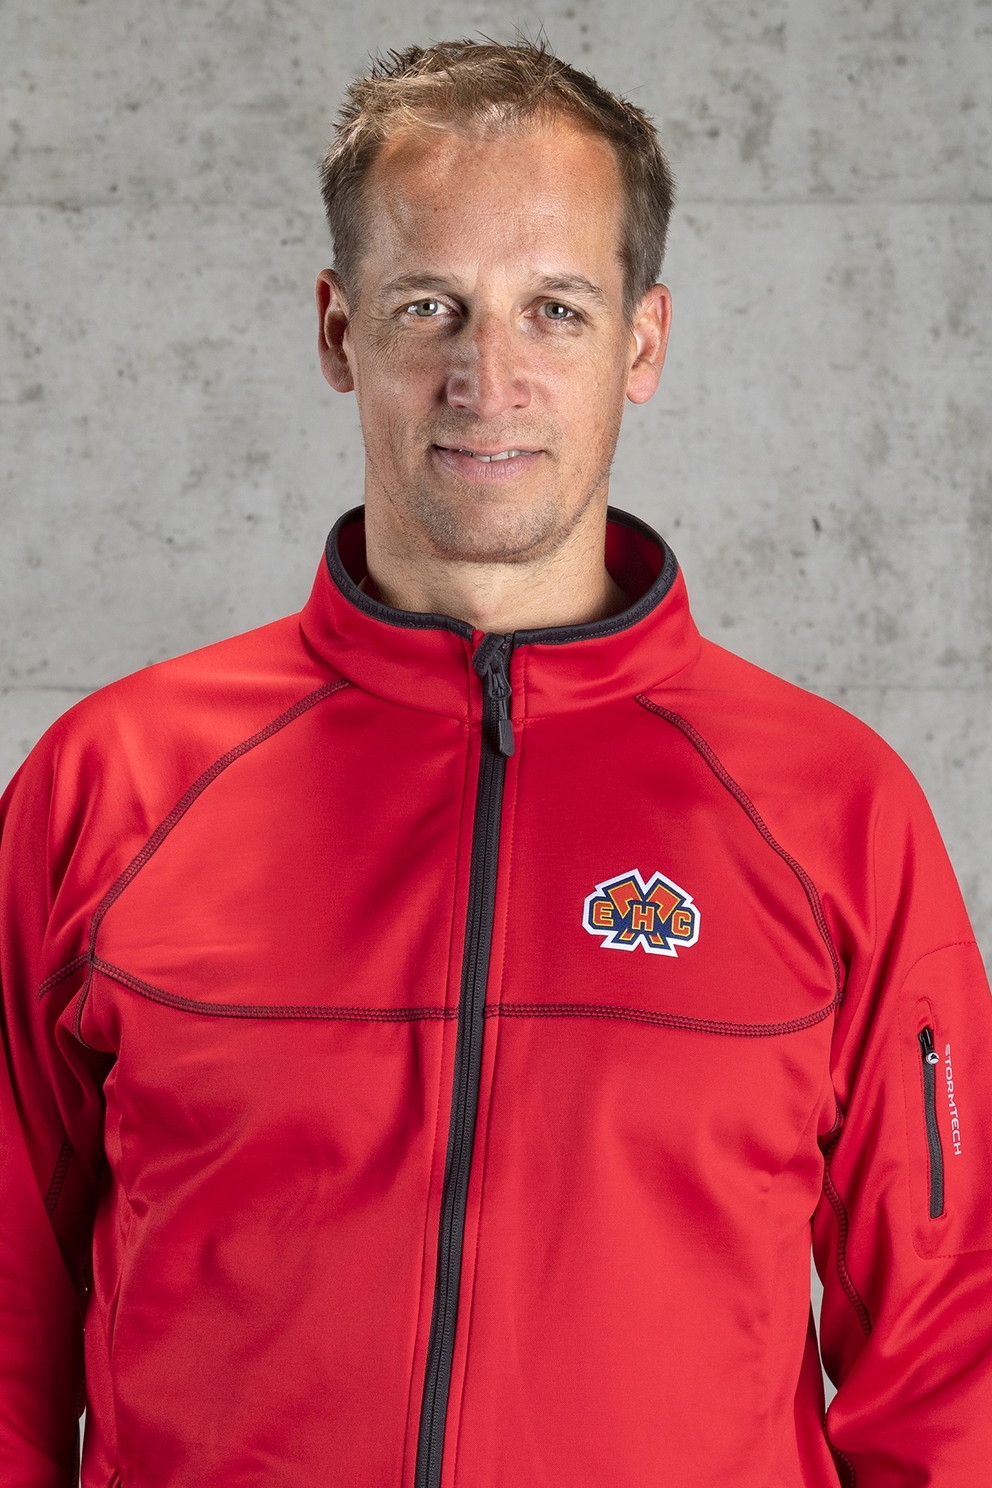 Antti Tormanen (Hockey Ghiaccio - Allenatore Bienne)